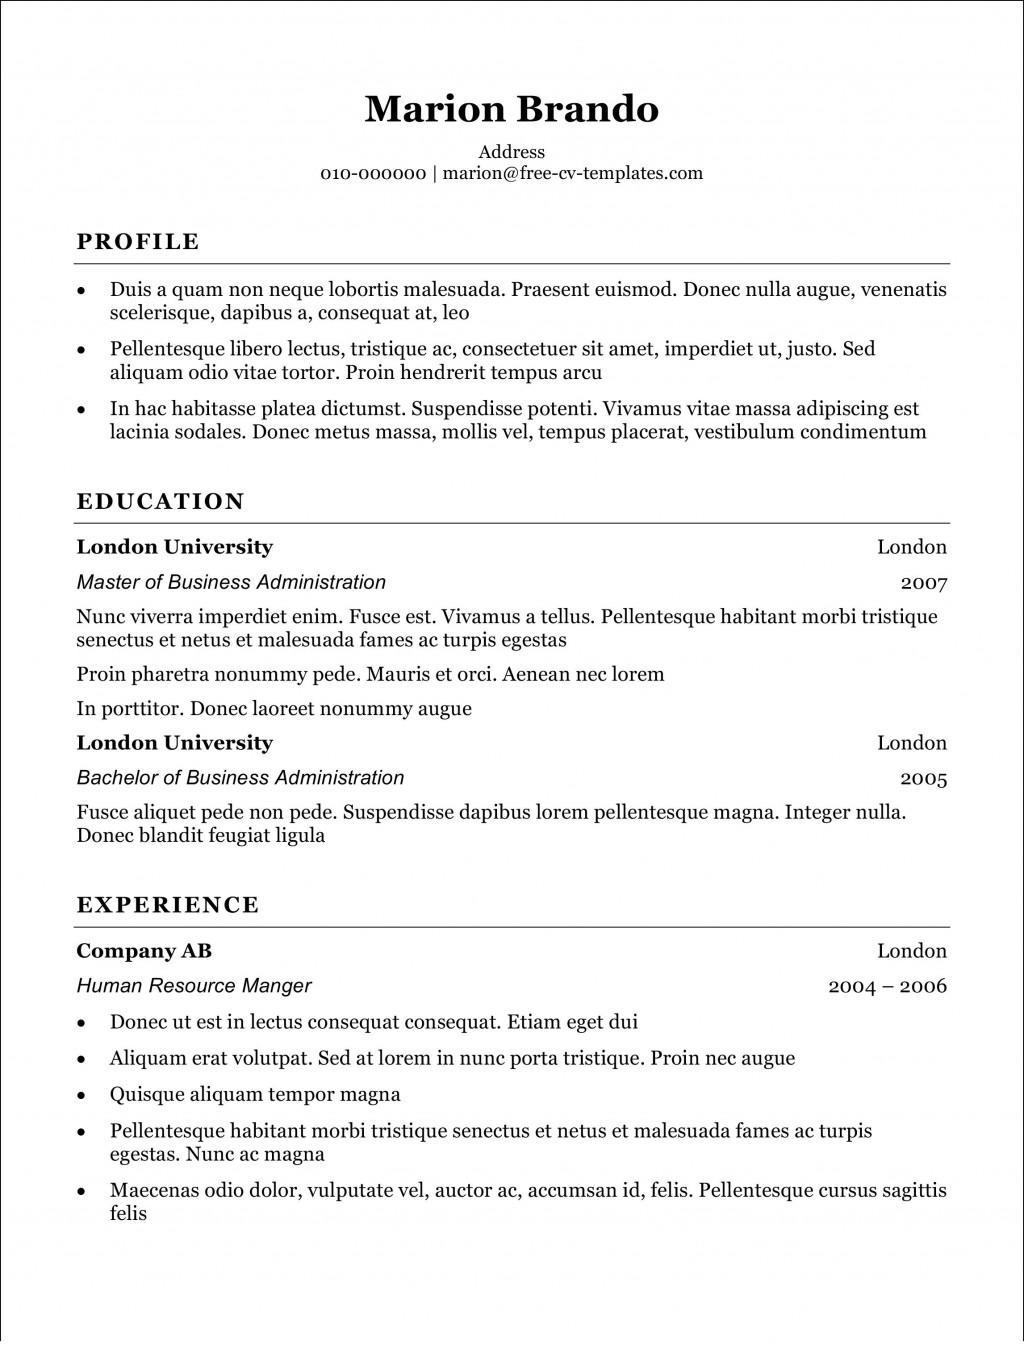 003 Singular Free Resume Template Microsoft Office Word 2007 Image Large